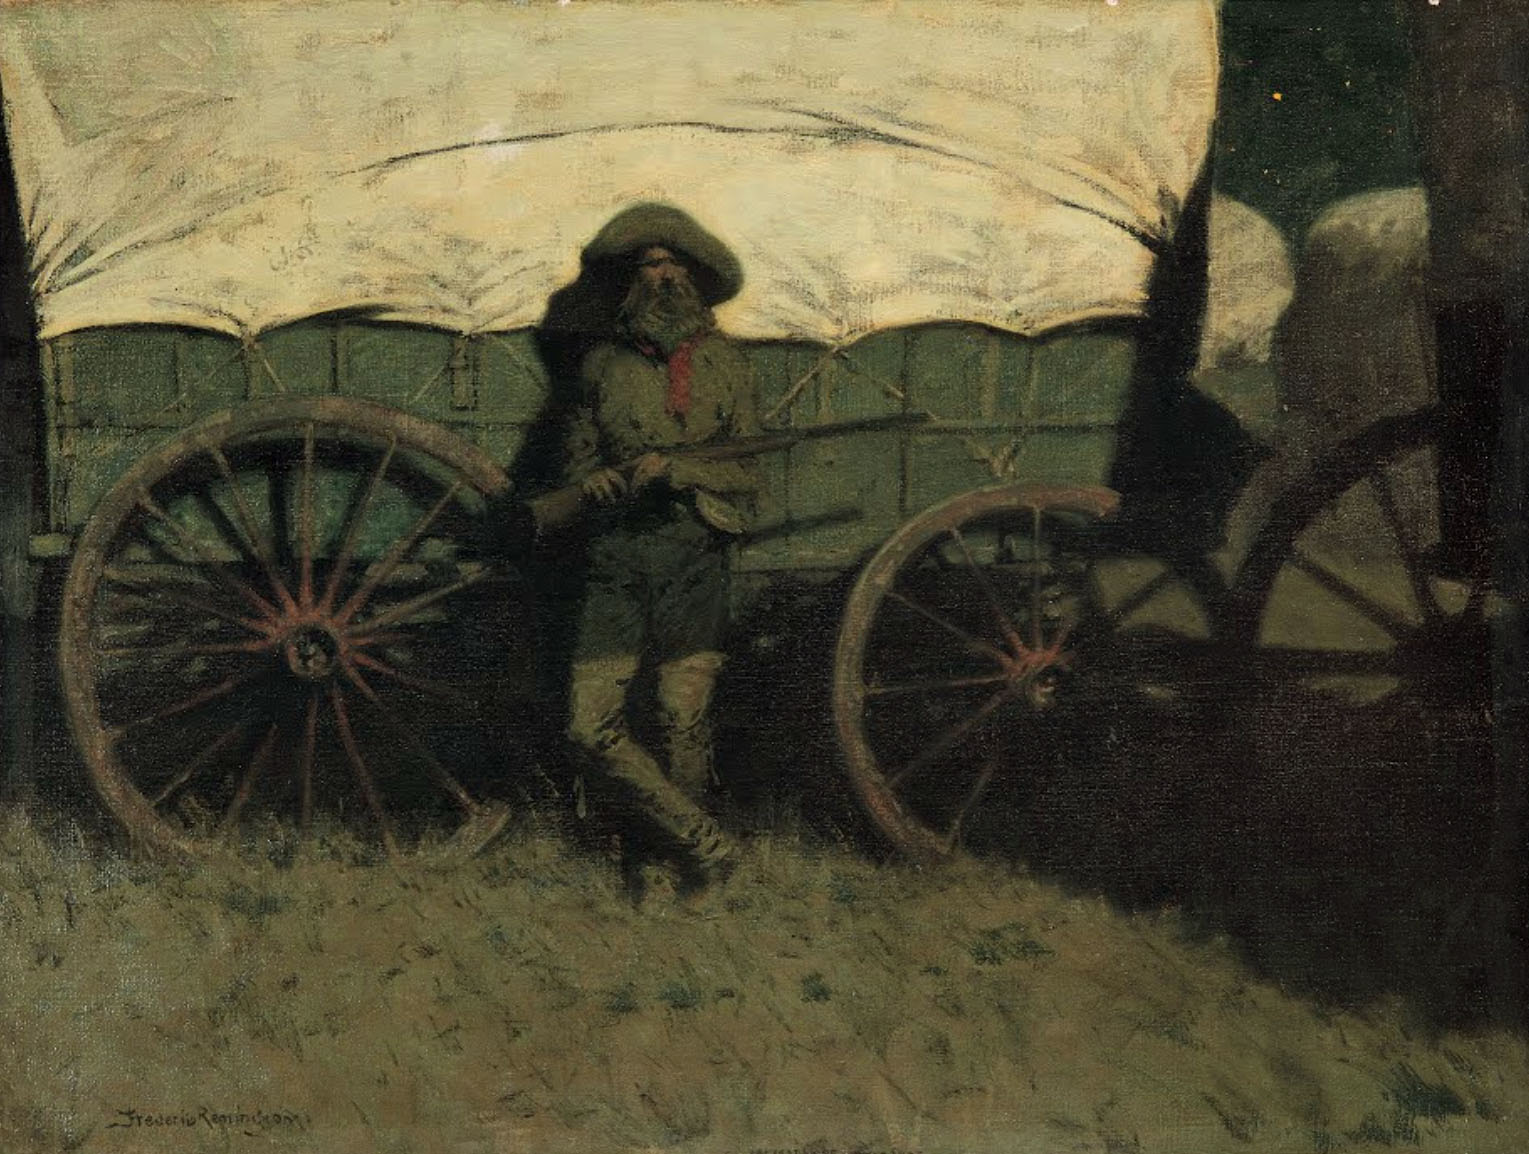 Frederic Remington - The Sentinel